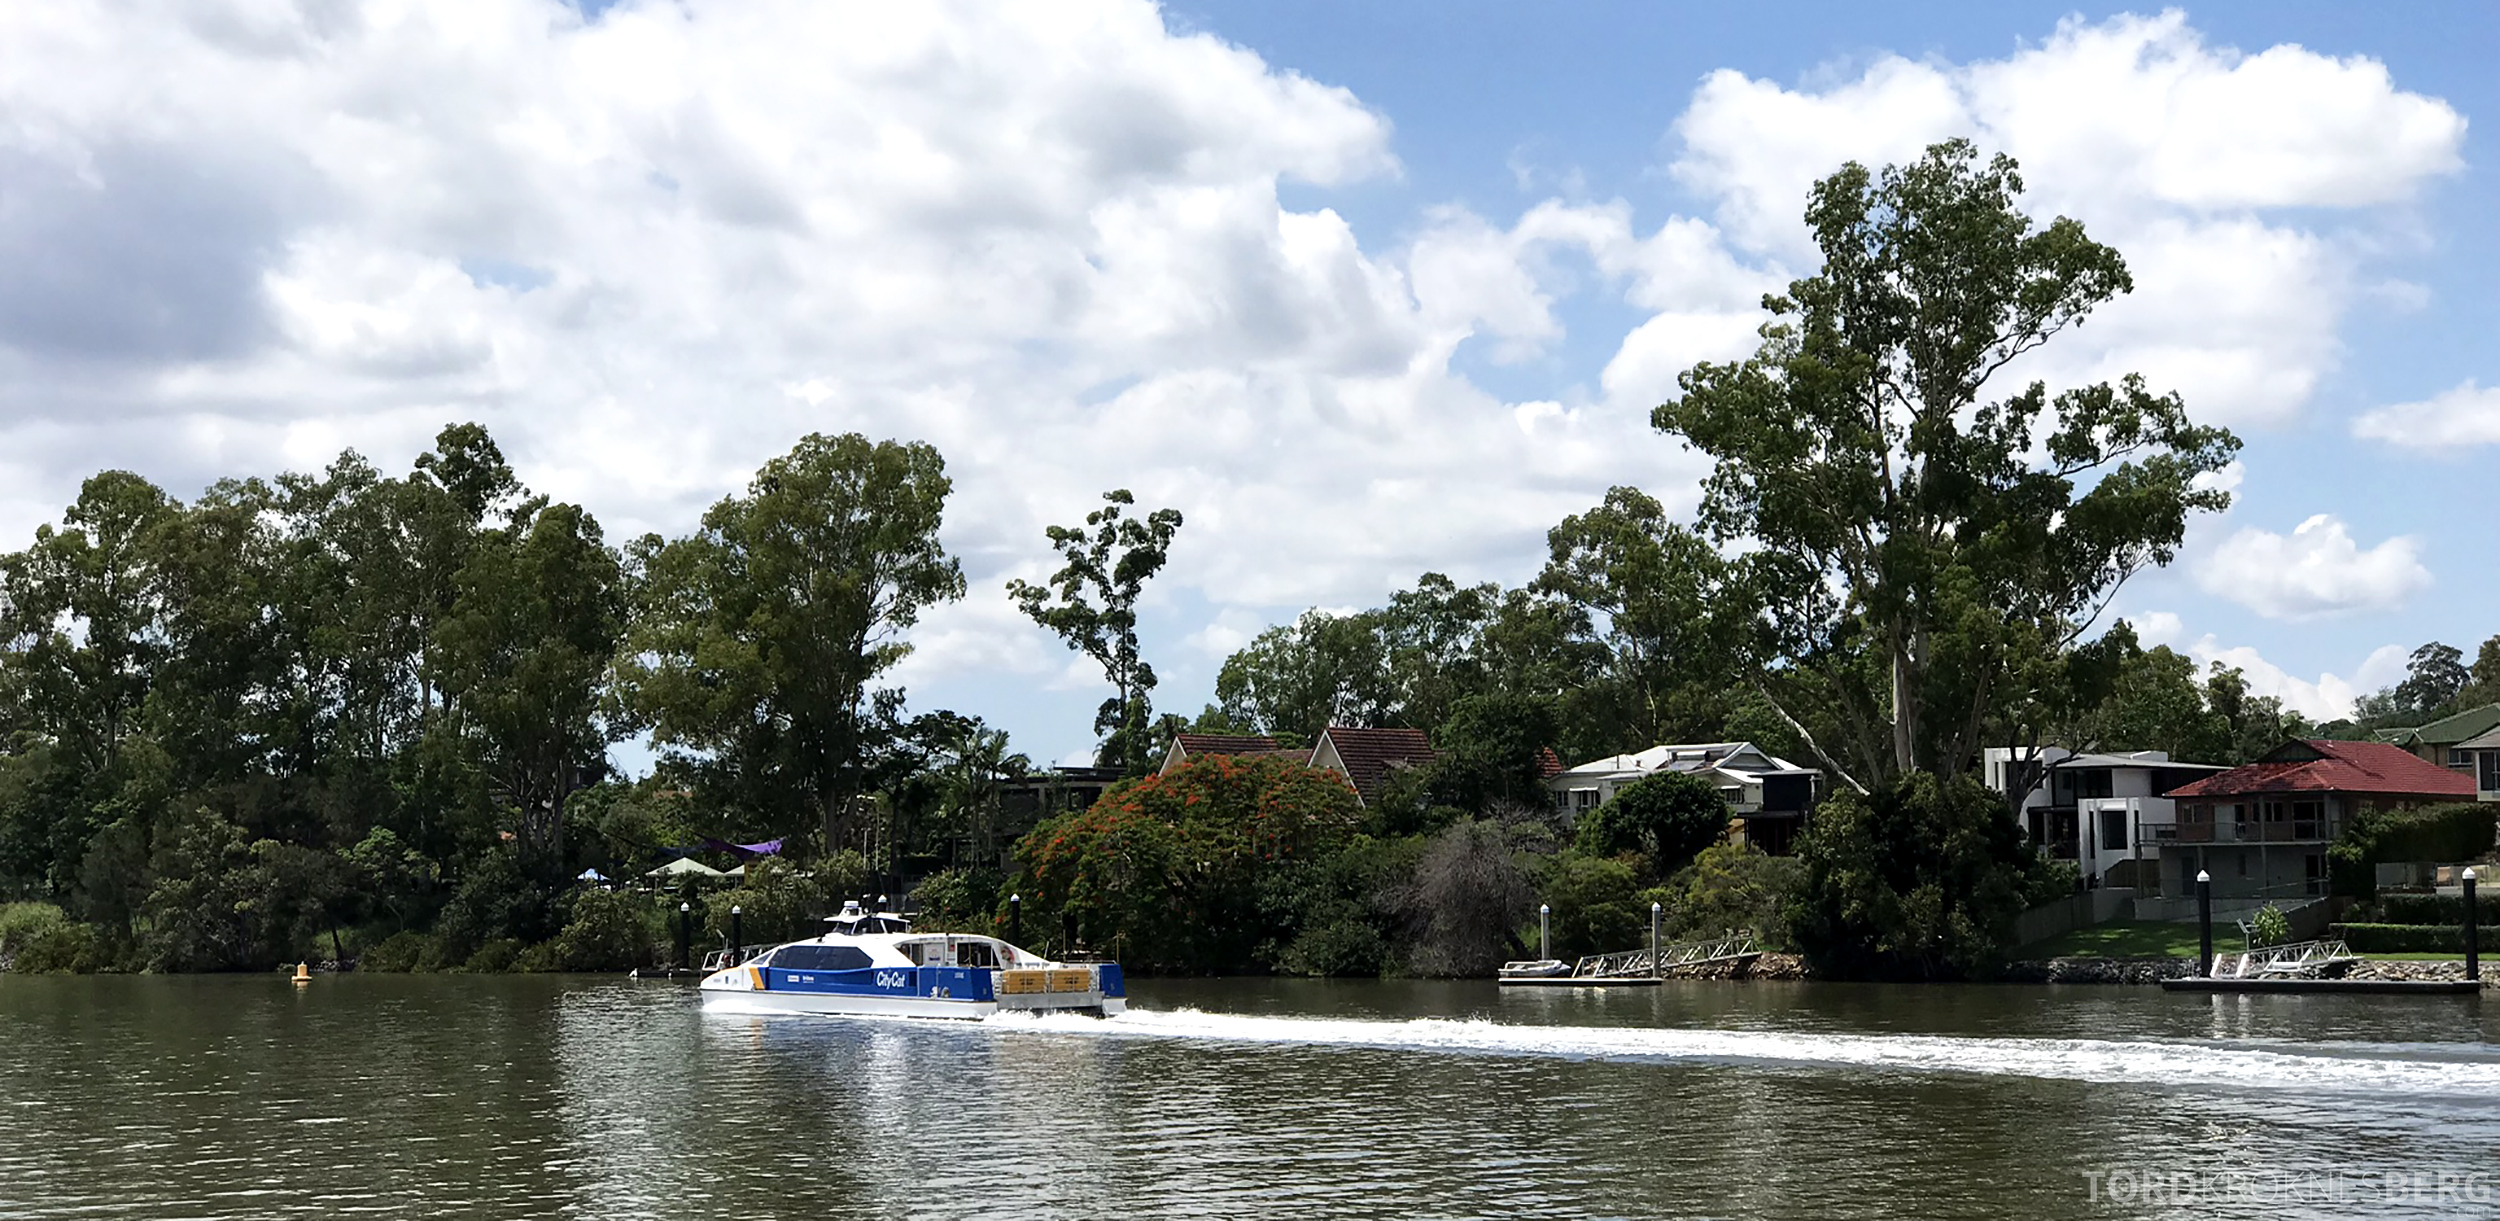 Lone Pine Koala Sanctuary Cruise Brisbane River